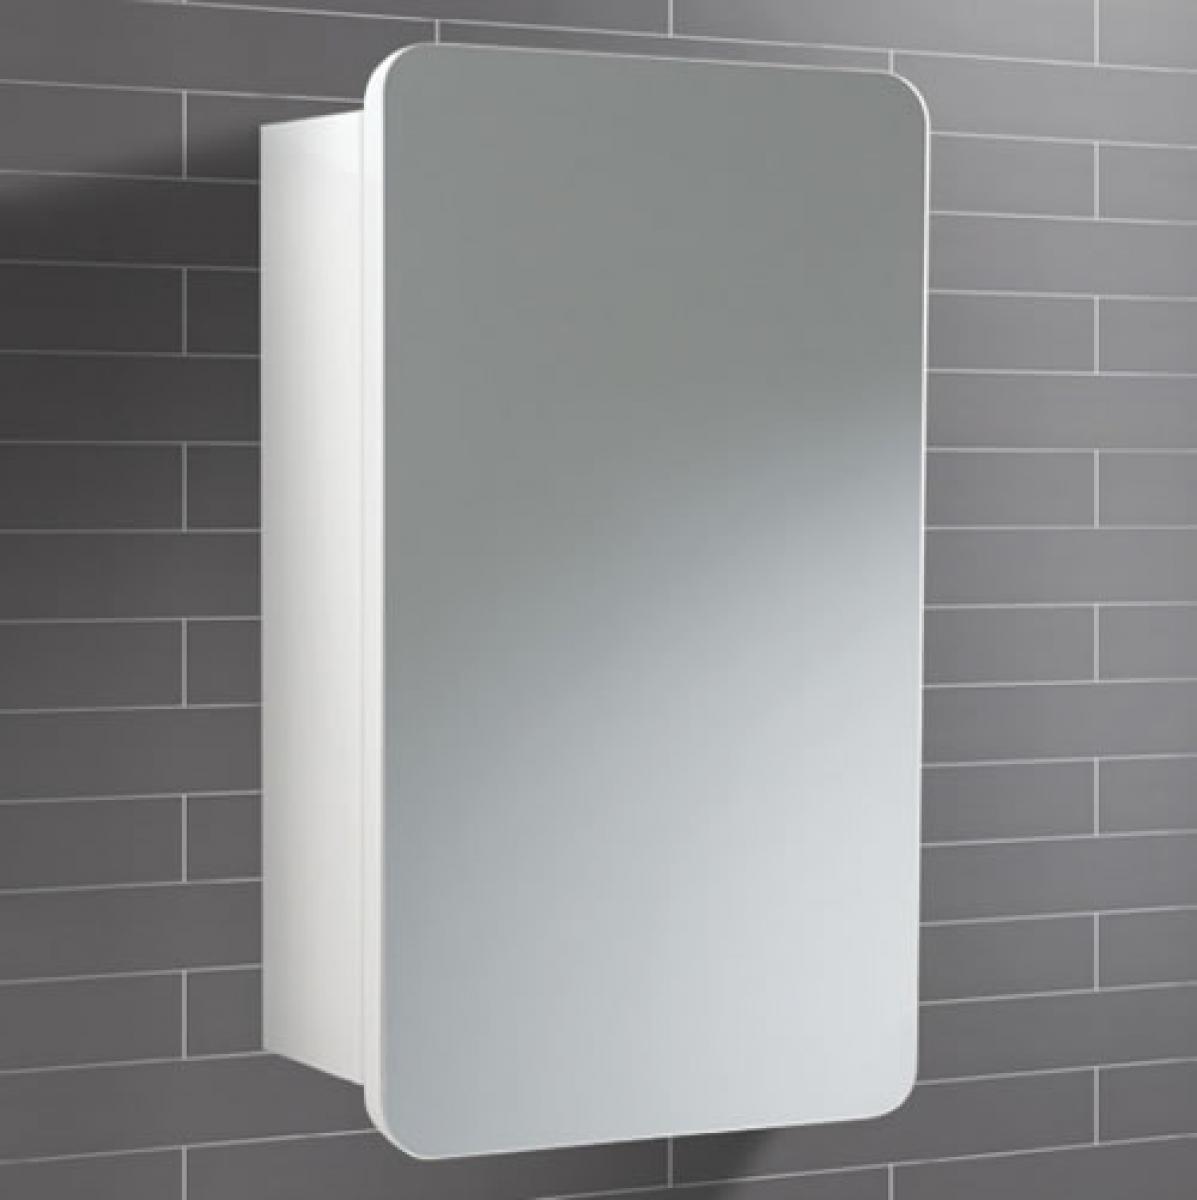 hib bathroom mirror cabinet 28 images hib vera bathroom mirror cabinet 993 856007 hib. Black Bedroom Furniture Sets. Home Design Ideas